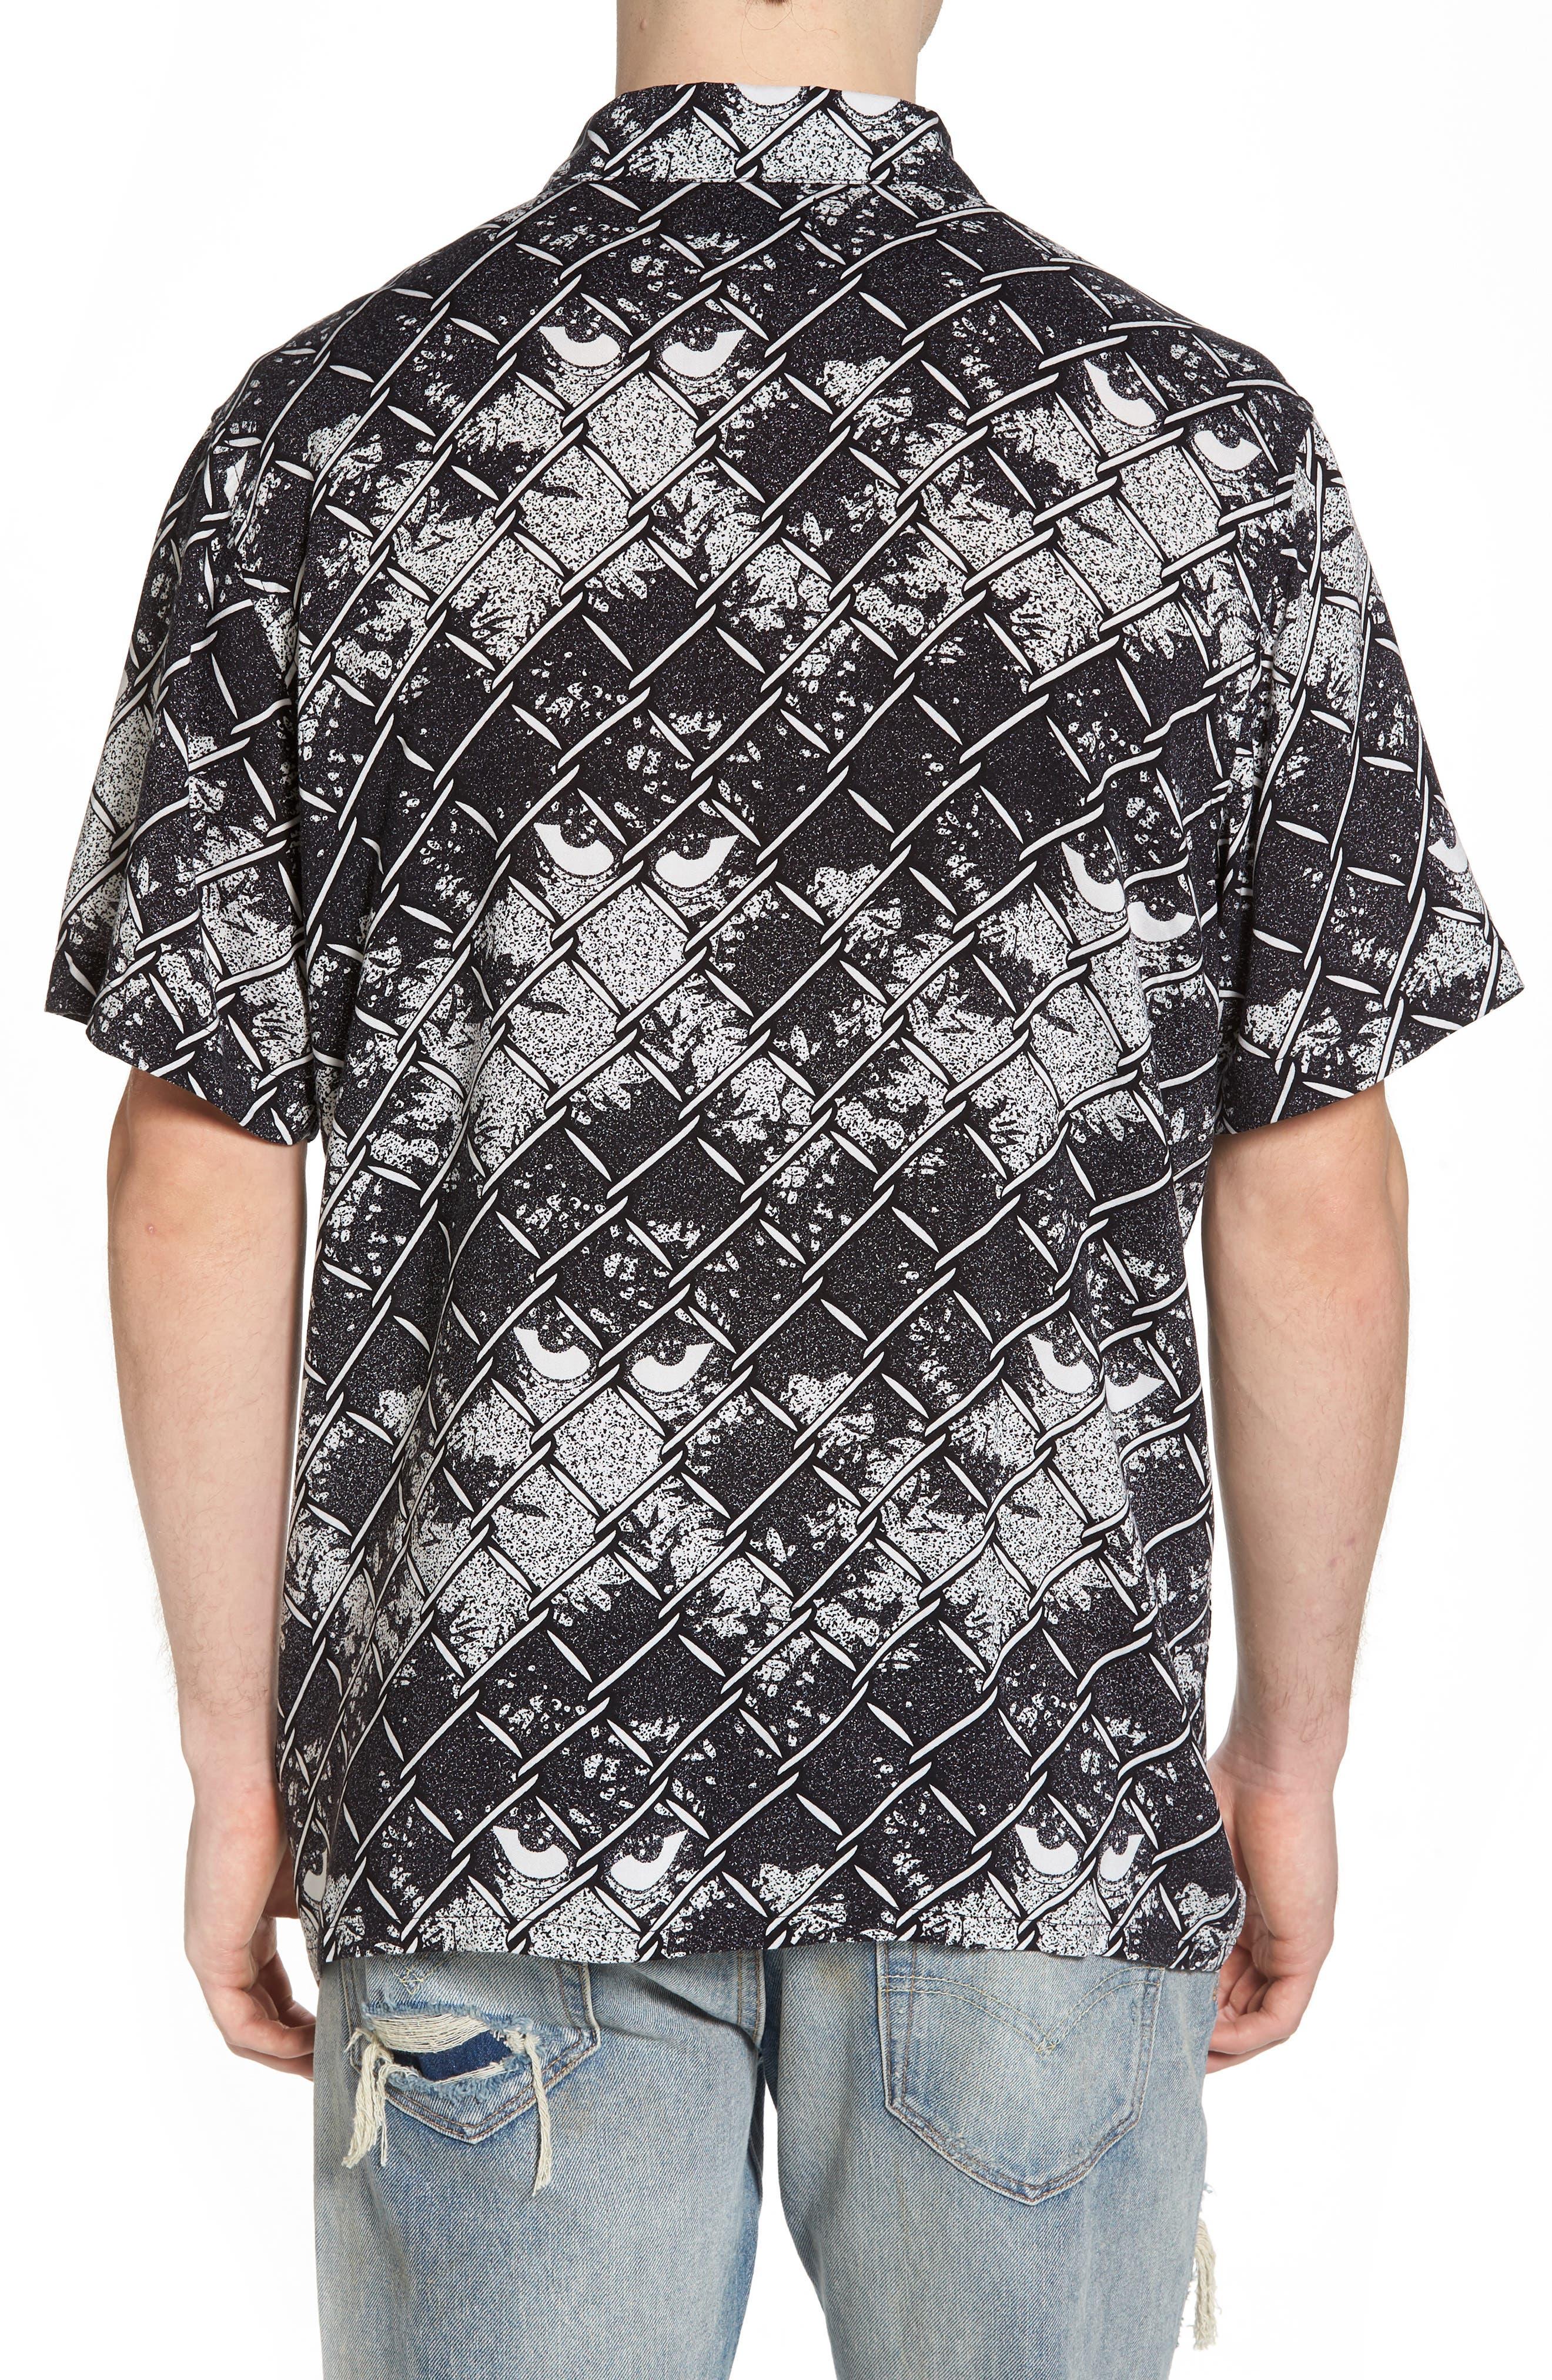 Gatekeeper Short Sleeve Shirt,                             Alternate thumbnail 2, color,                             Black Multi